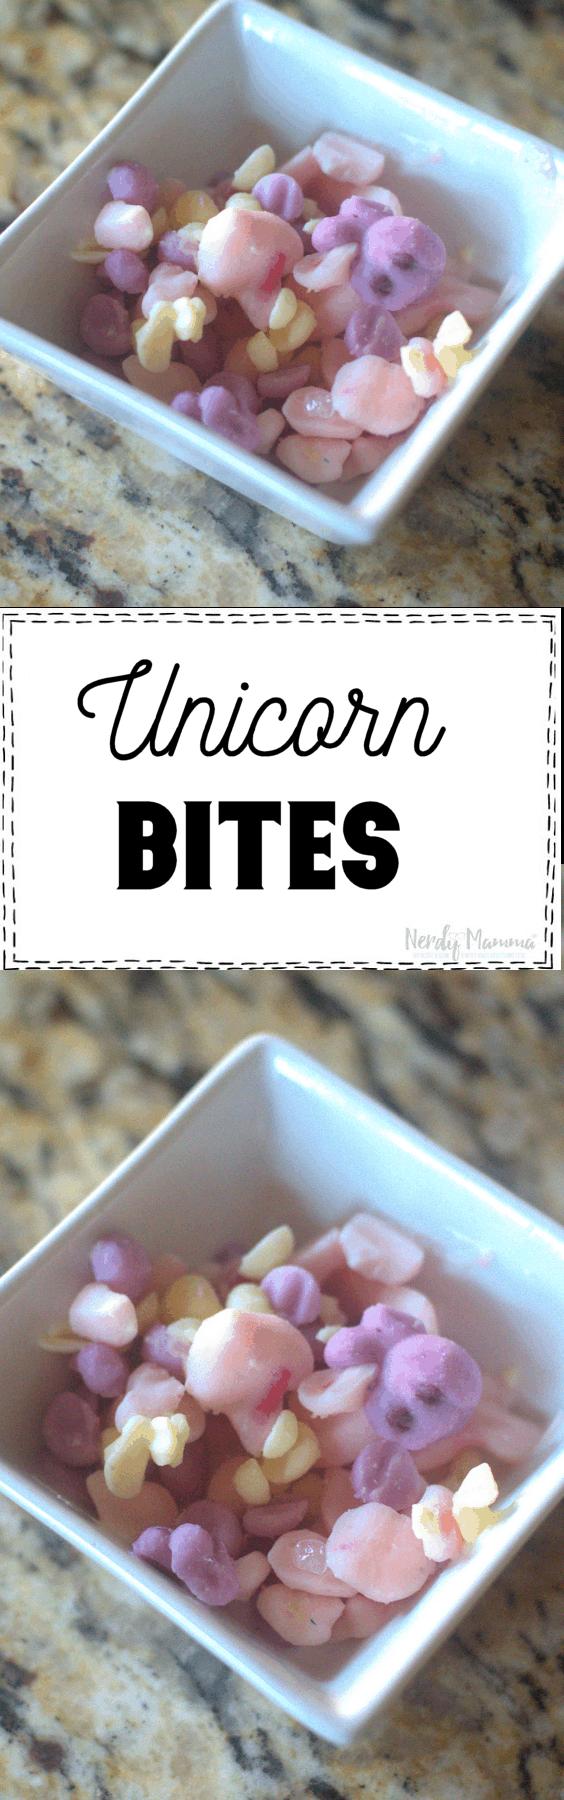 Unicorn Bite treats